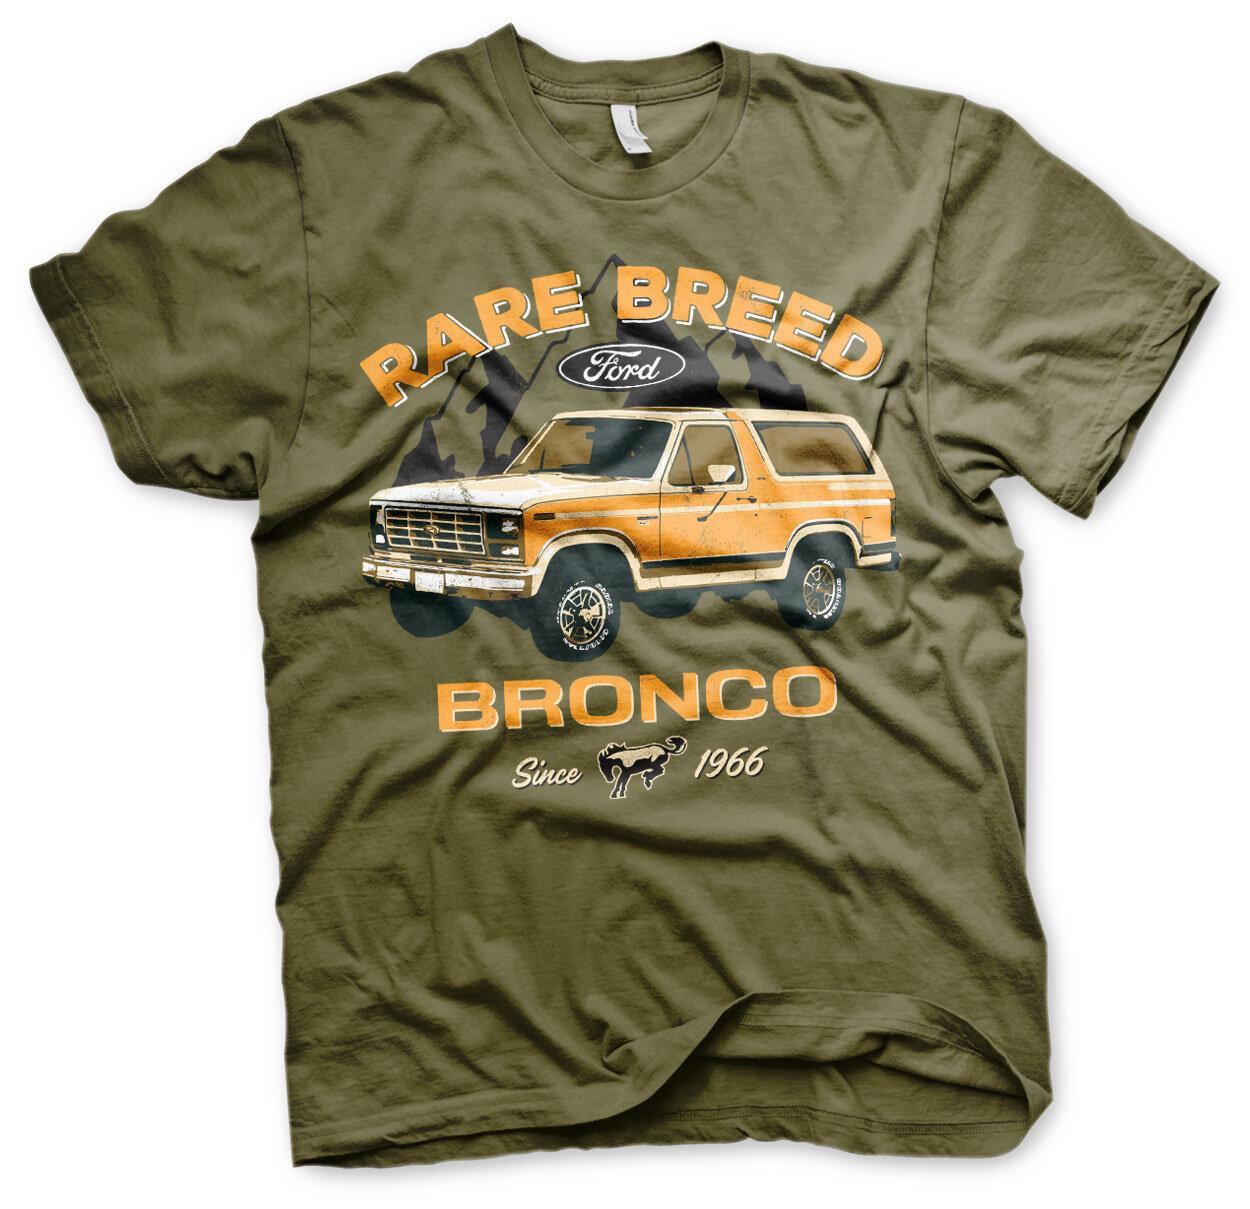 Ford Bronco - Rare Breed T-Shirt